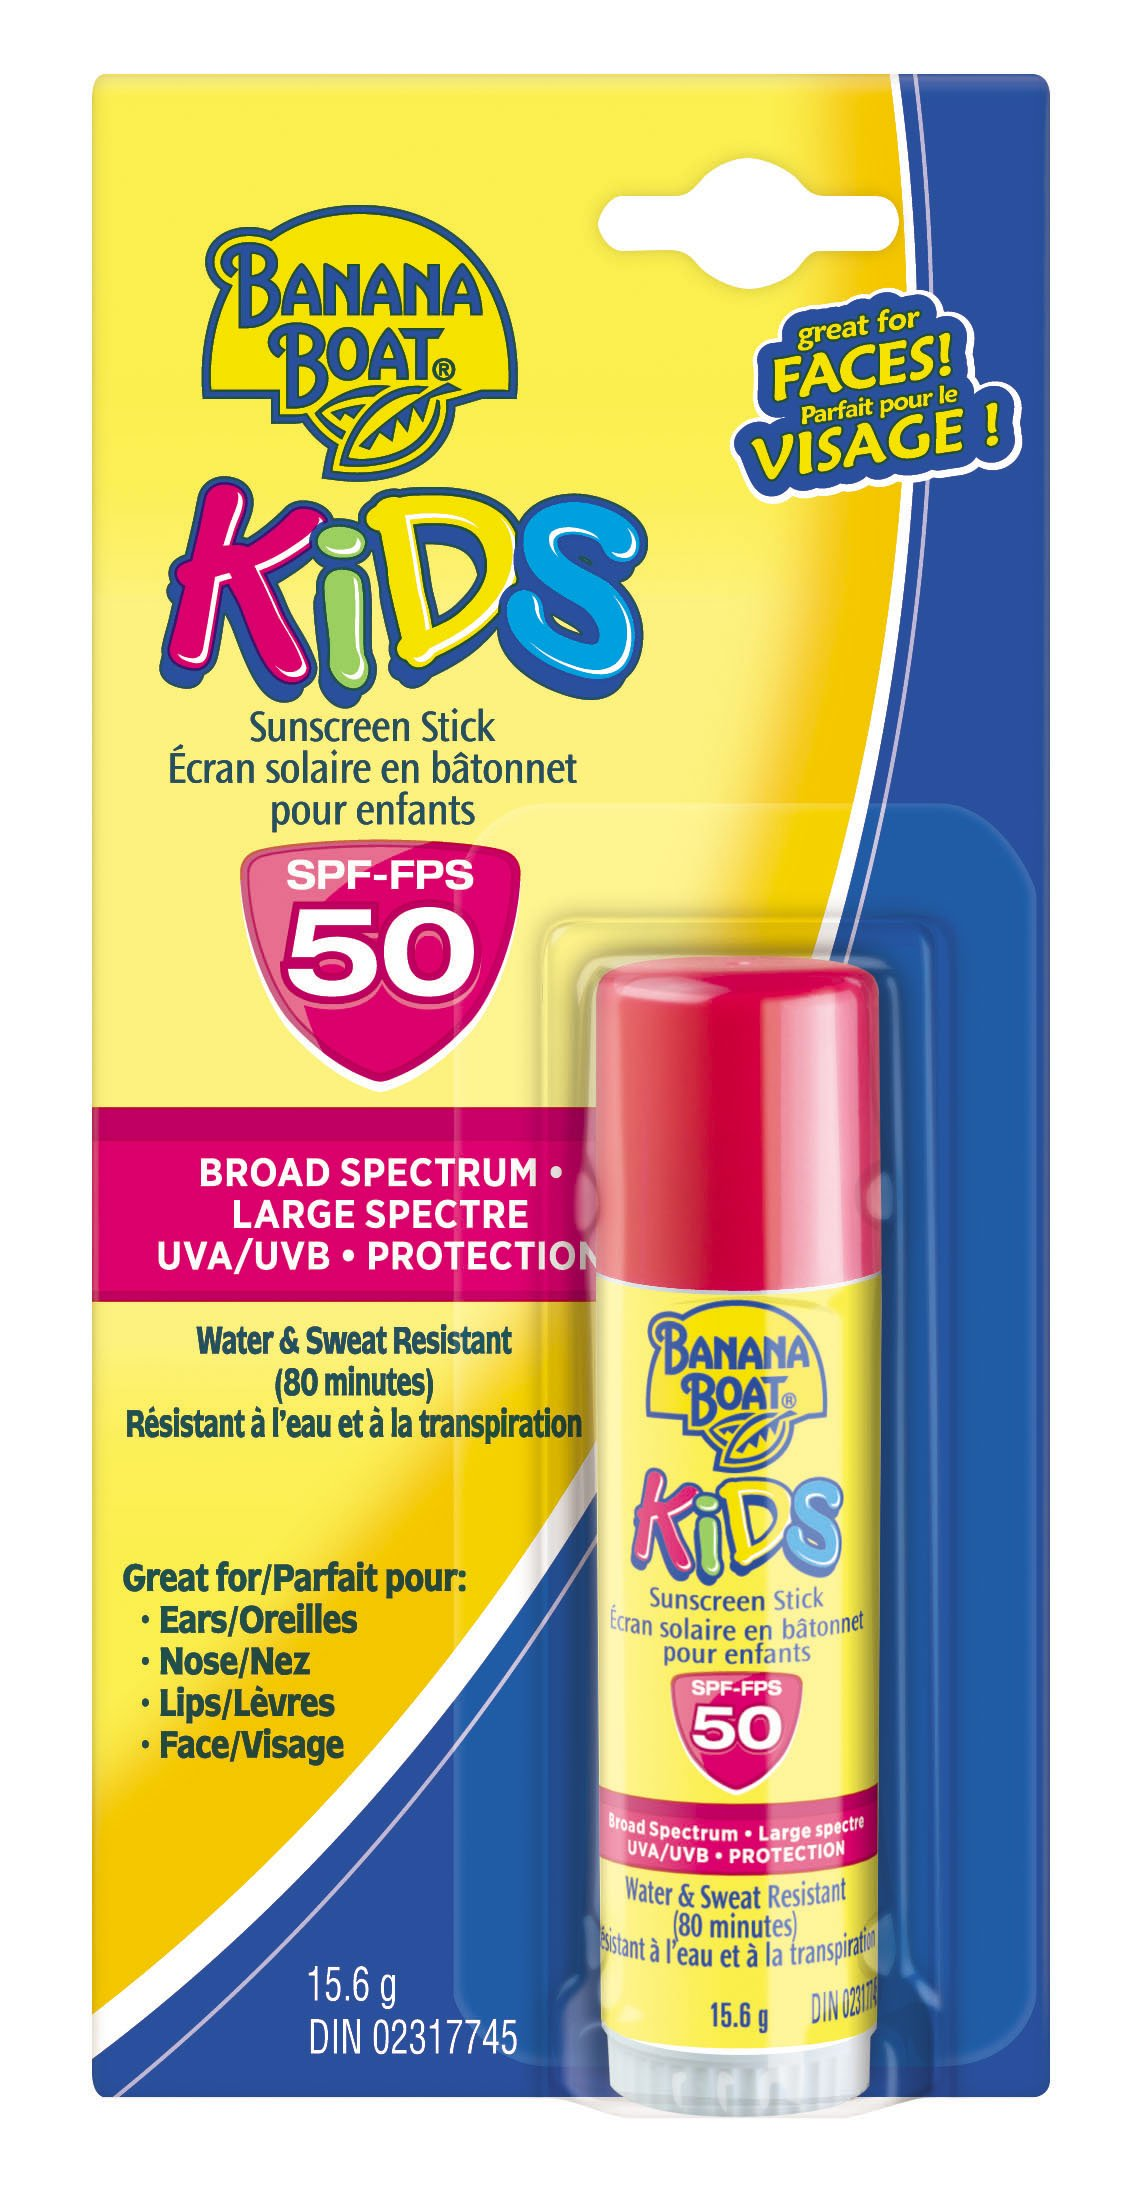 Banana Boat Sunscreen Kids Broad Spectrum Sun Care Sunscreen Stick - SPF 50 (Pack of 4) by Banana Boat